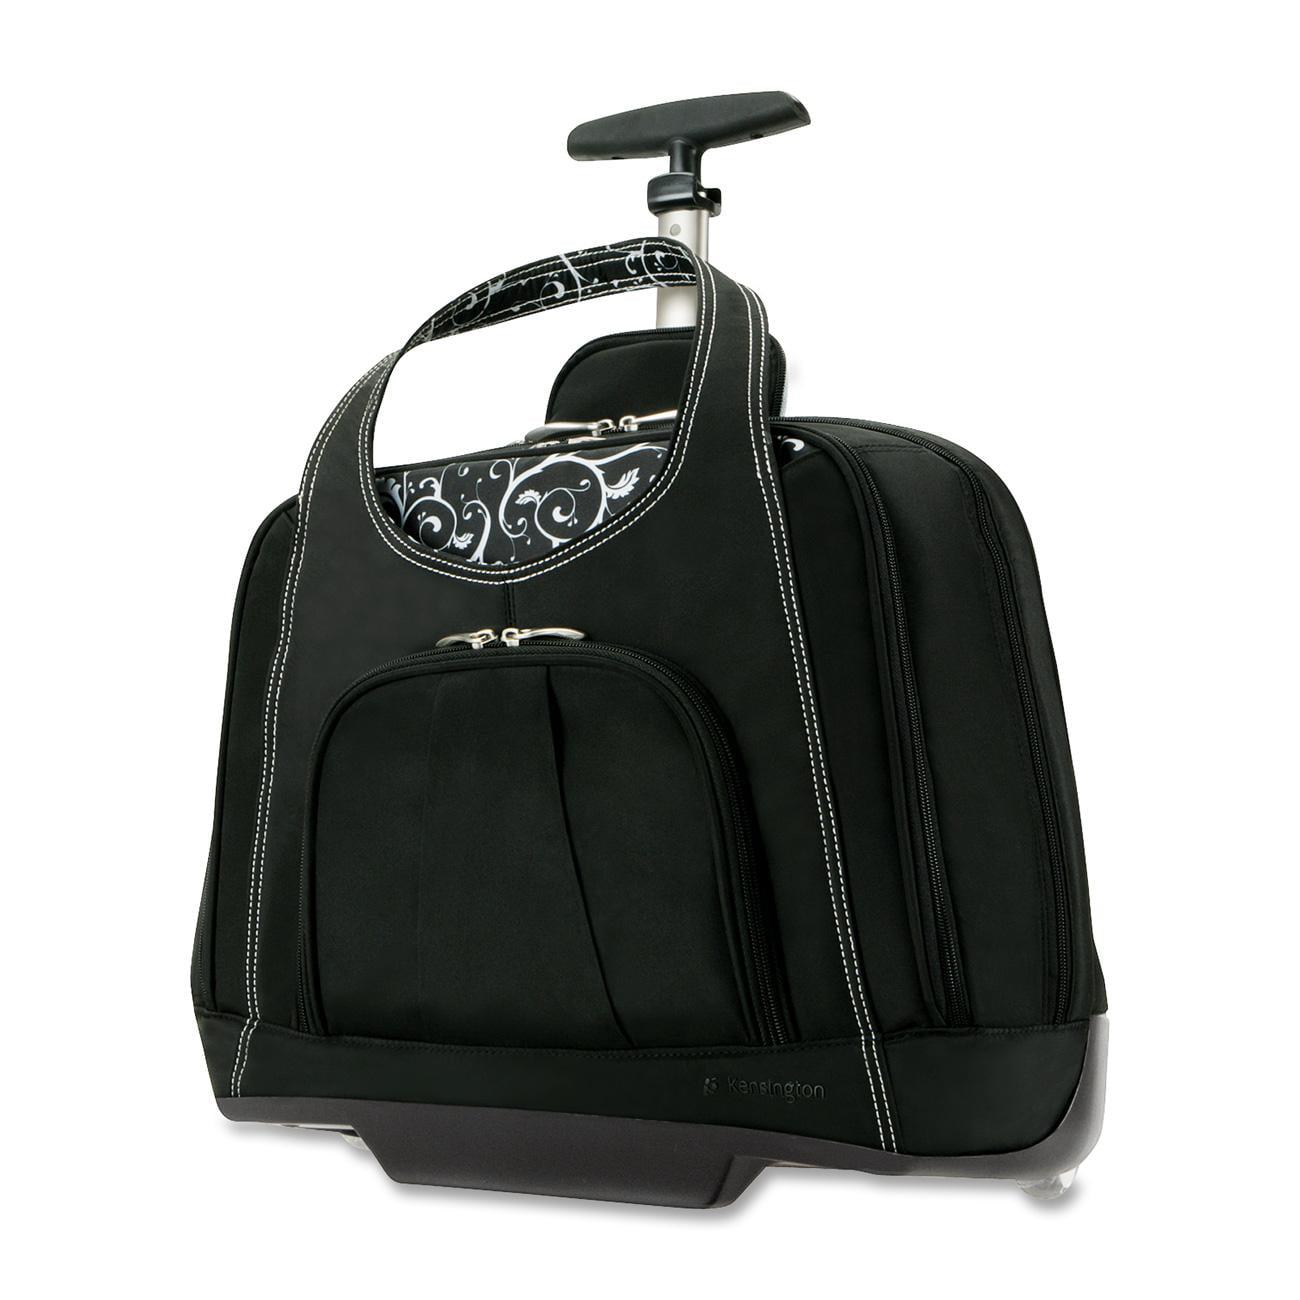 "Kensington Contour Carrying Case (Roller) for 15.4"" Notebook Onyx by Kensington"